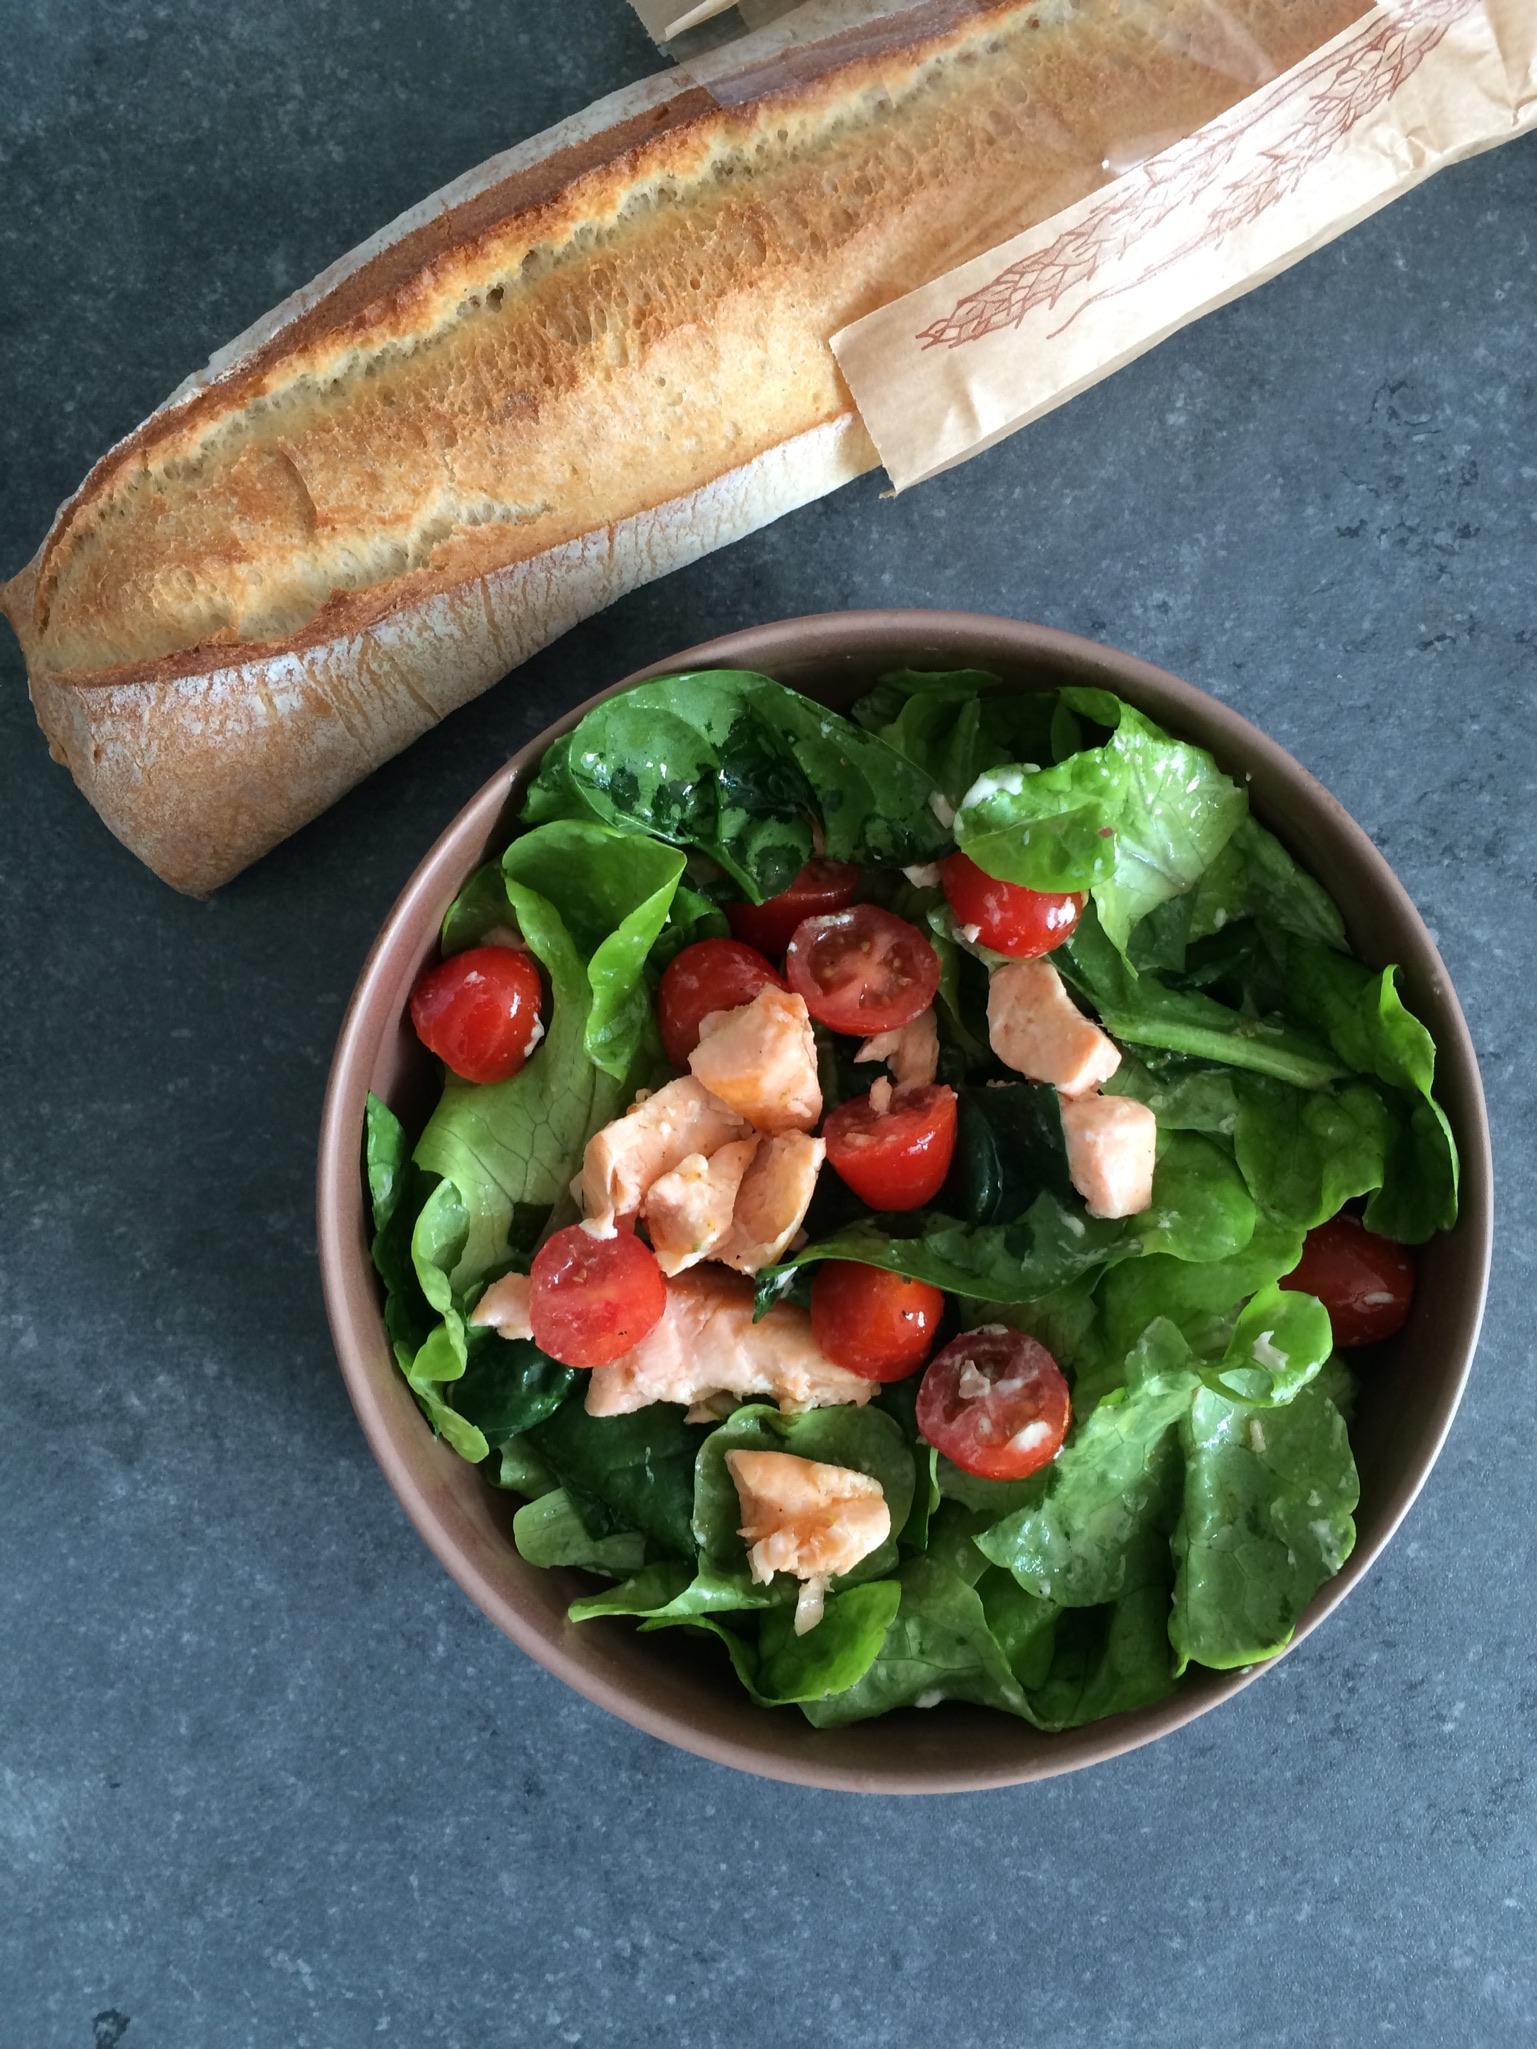 Salade verte, saumon et tomates cerises